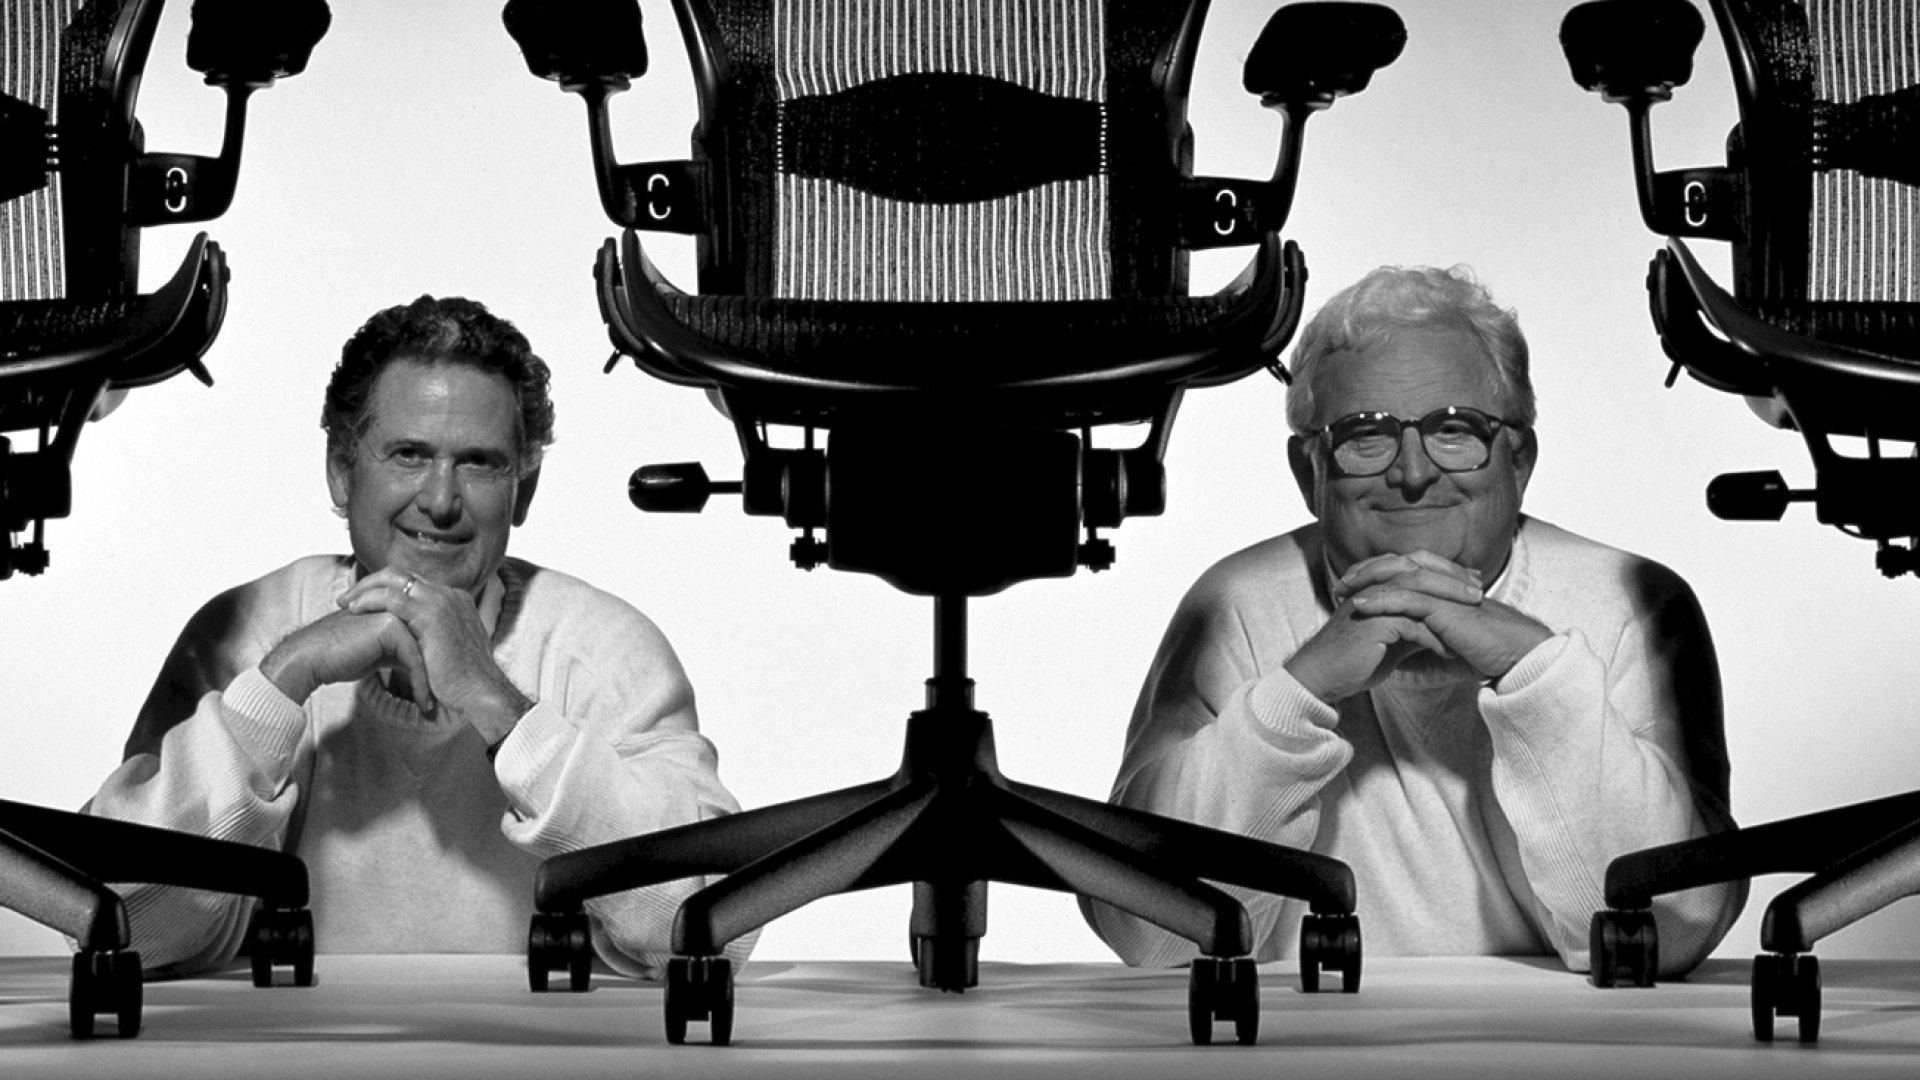 Iconic Aeron Office Chair Creators Don Chadwick and Bill Stumpf